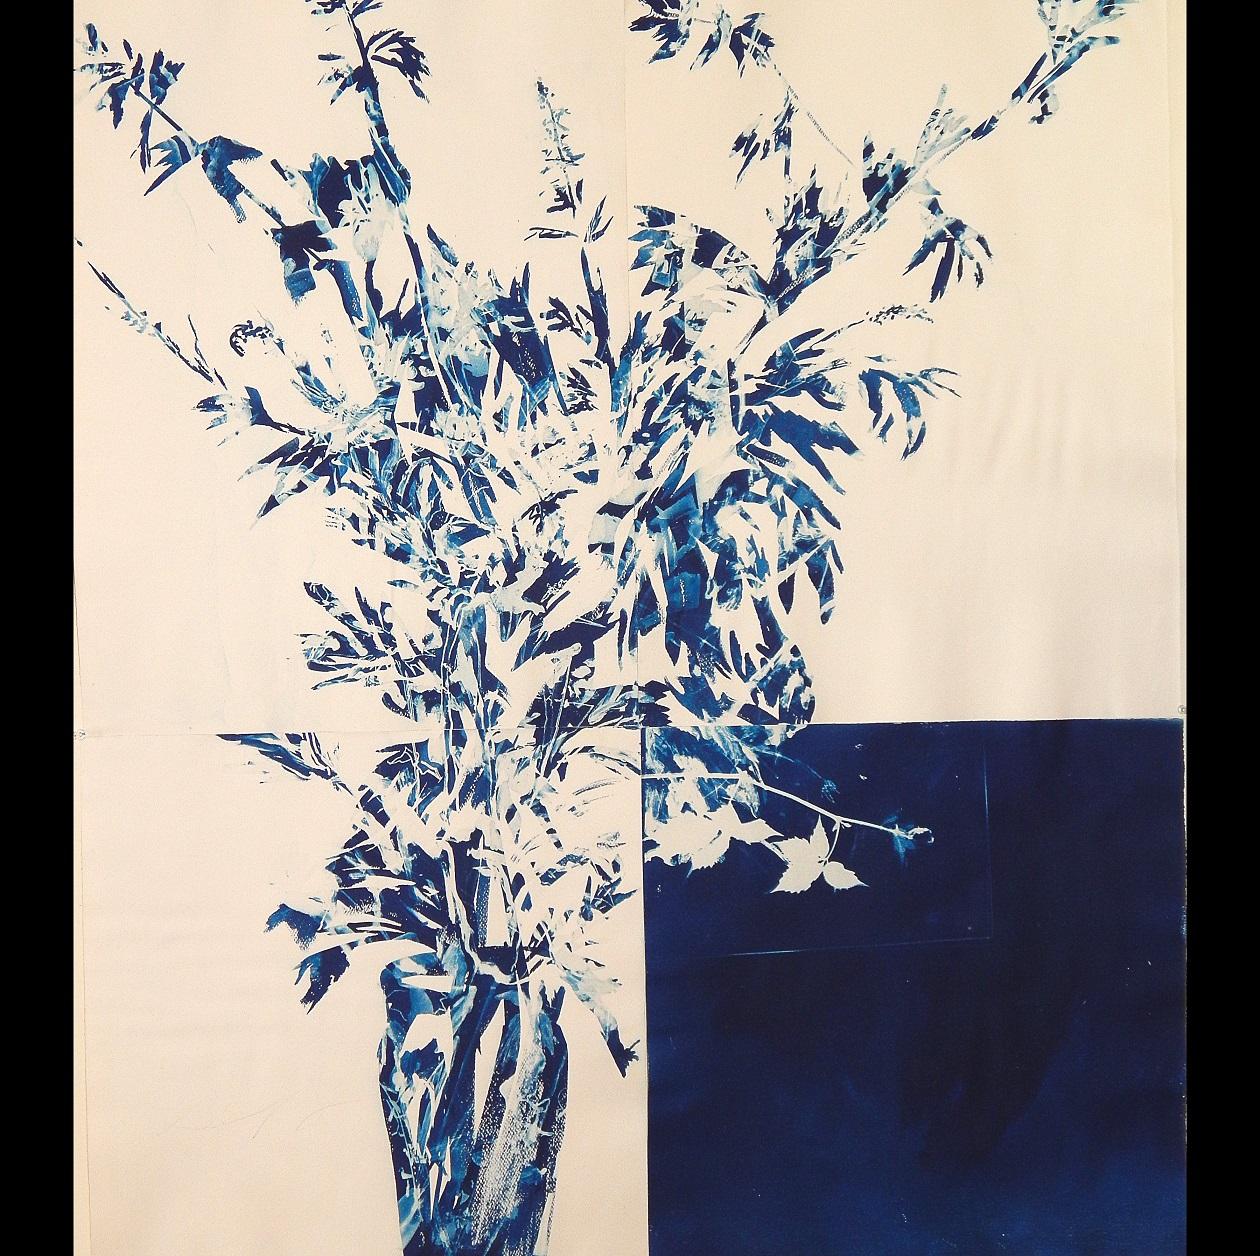 Centerpiece, 2012, cyanotype